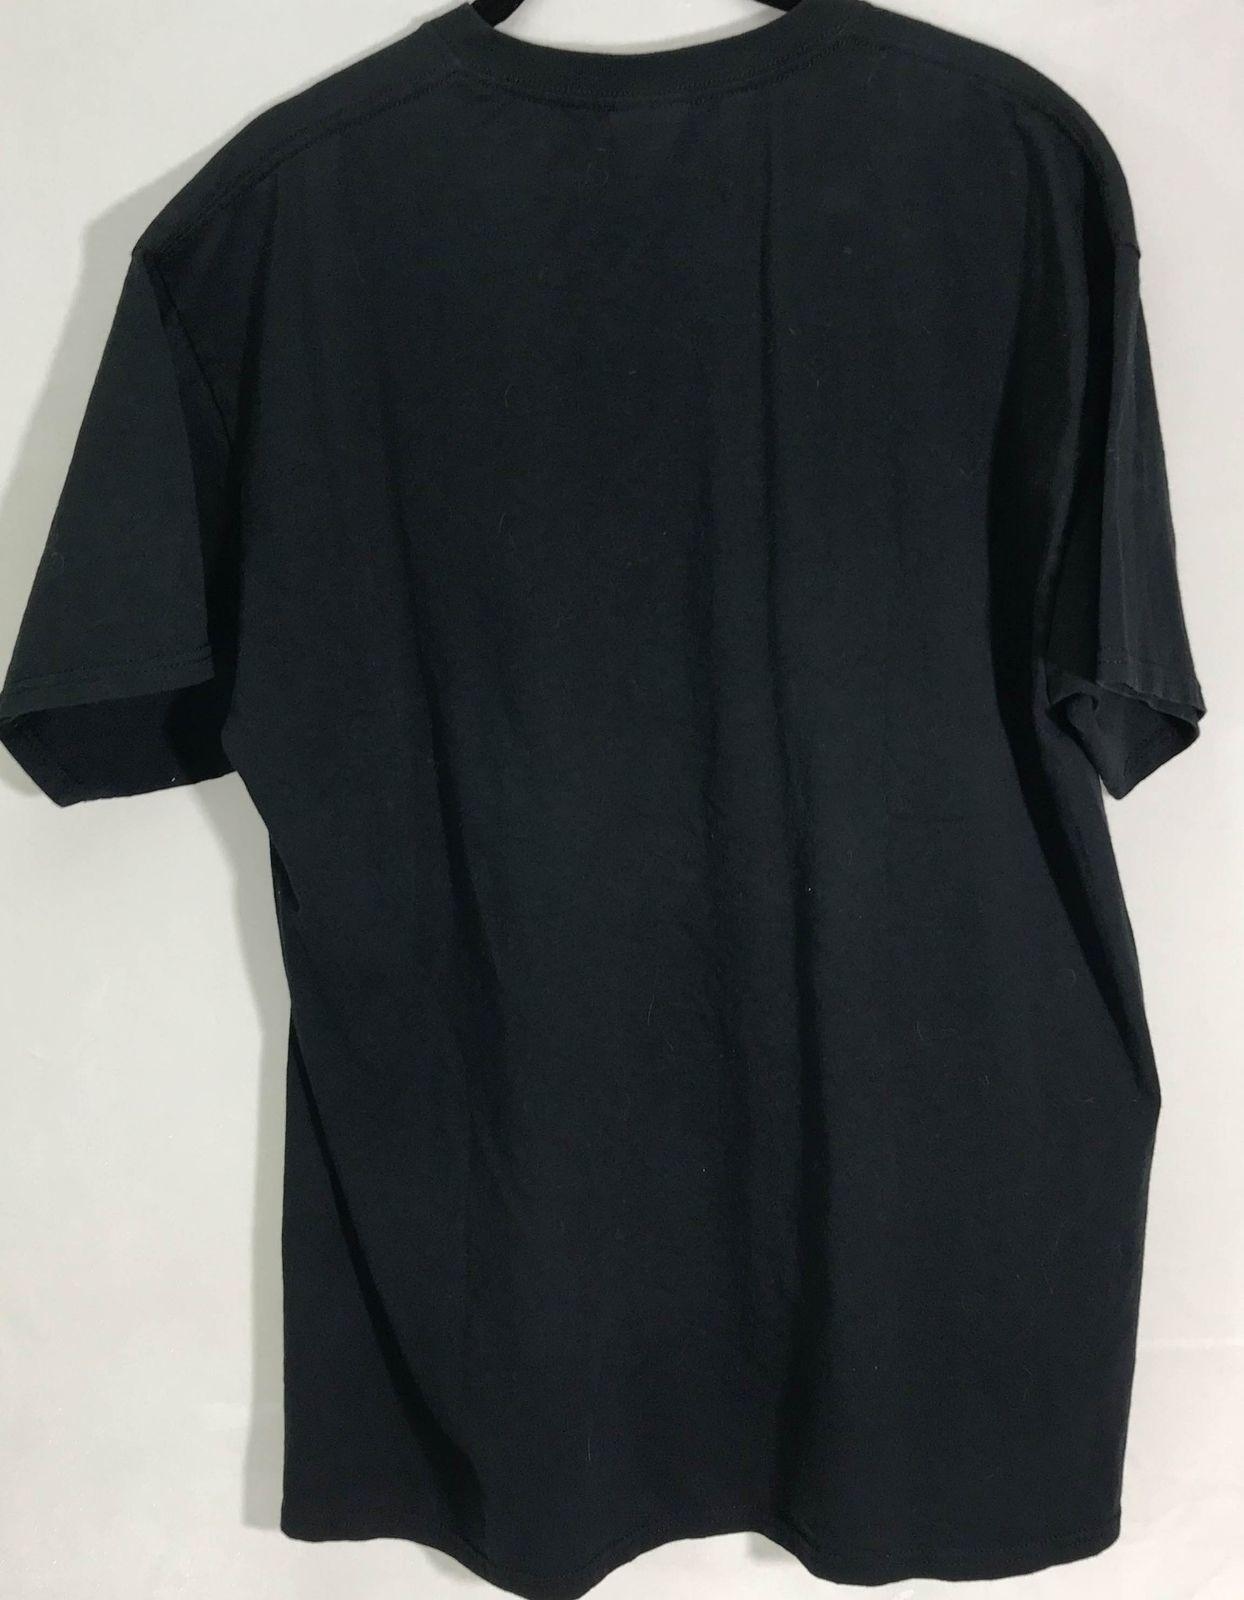 Mr FurryPants L Black Disorderly Conduct Bad Cattitude Cat Mugshot T Shirt